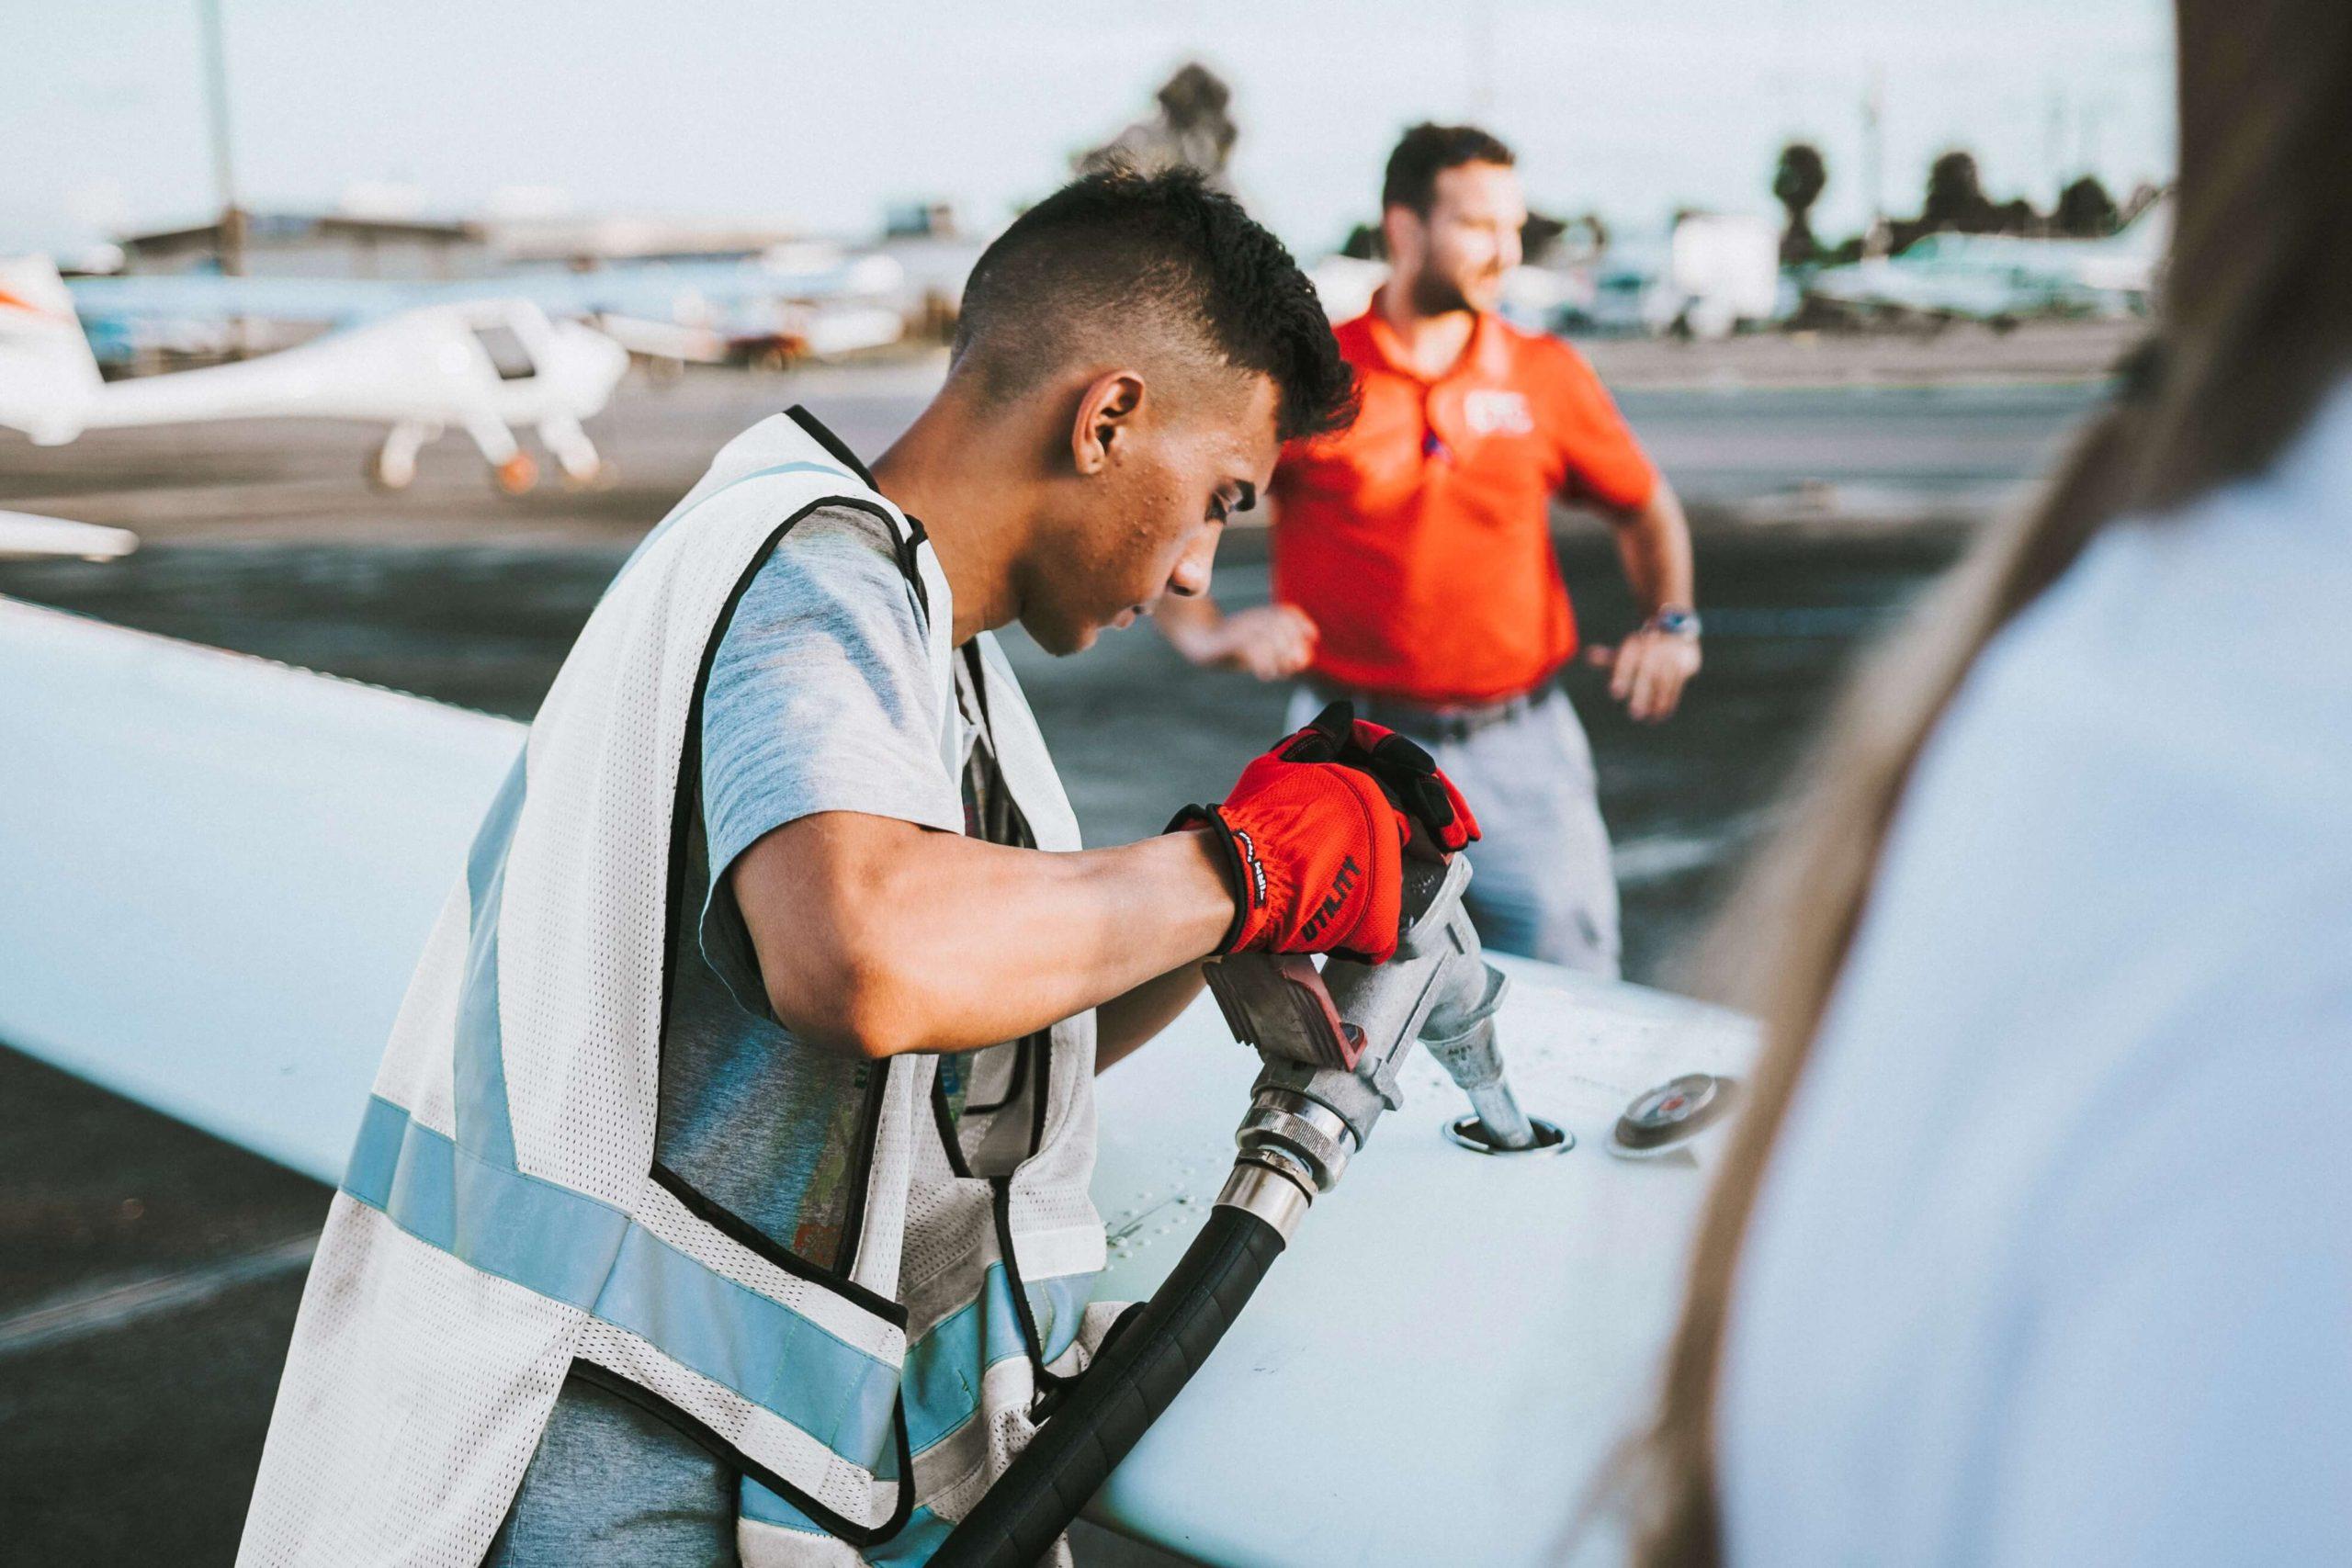 A man refueling an aeroplane